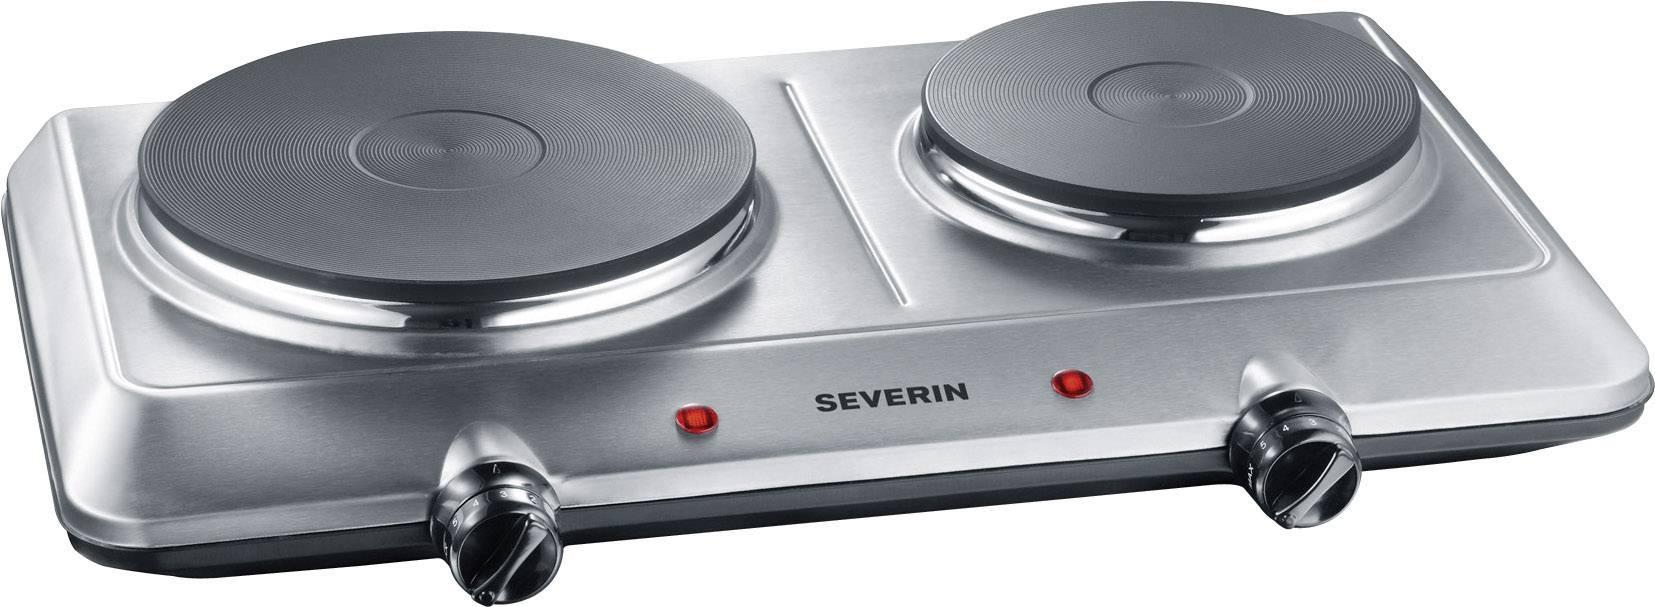 Dvojitá platňa Severin DK 1014 nerezová oceľ kartáčovaná